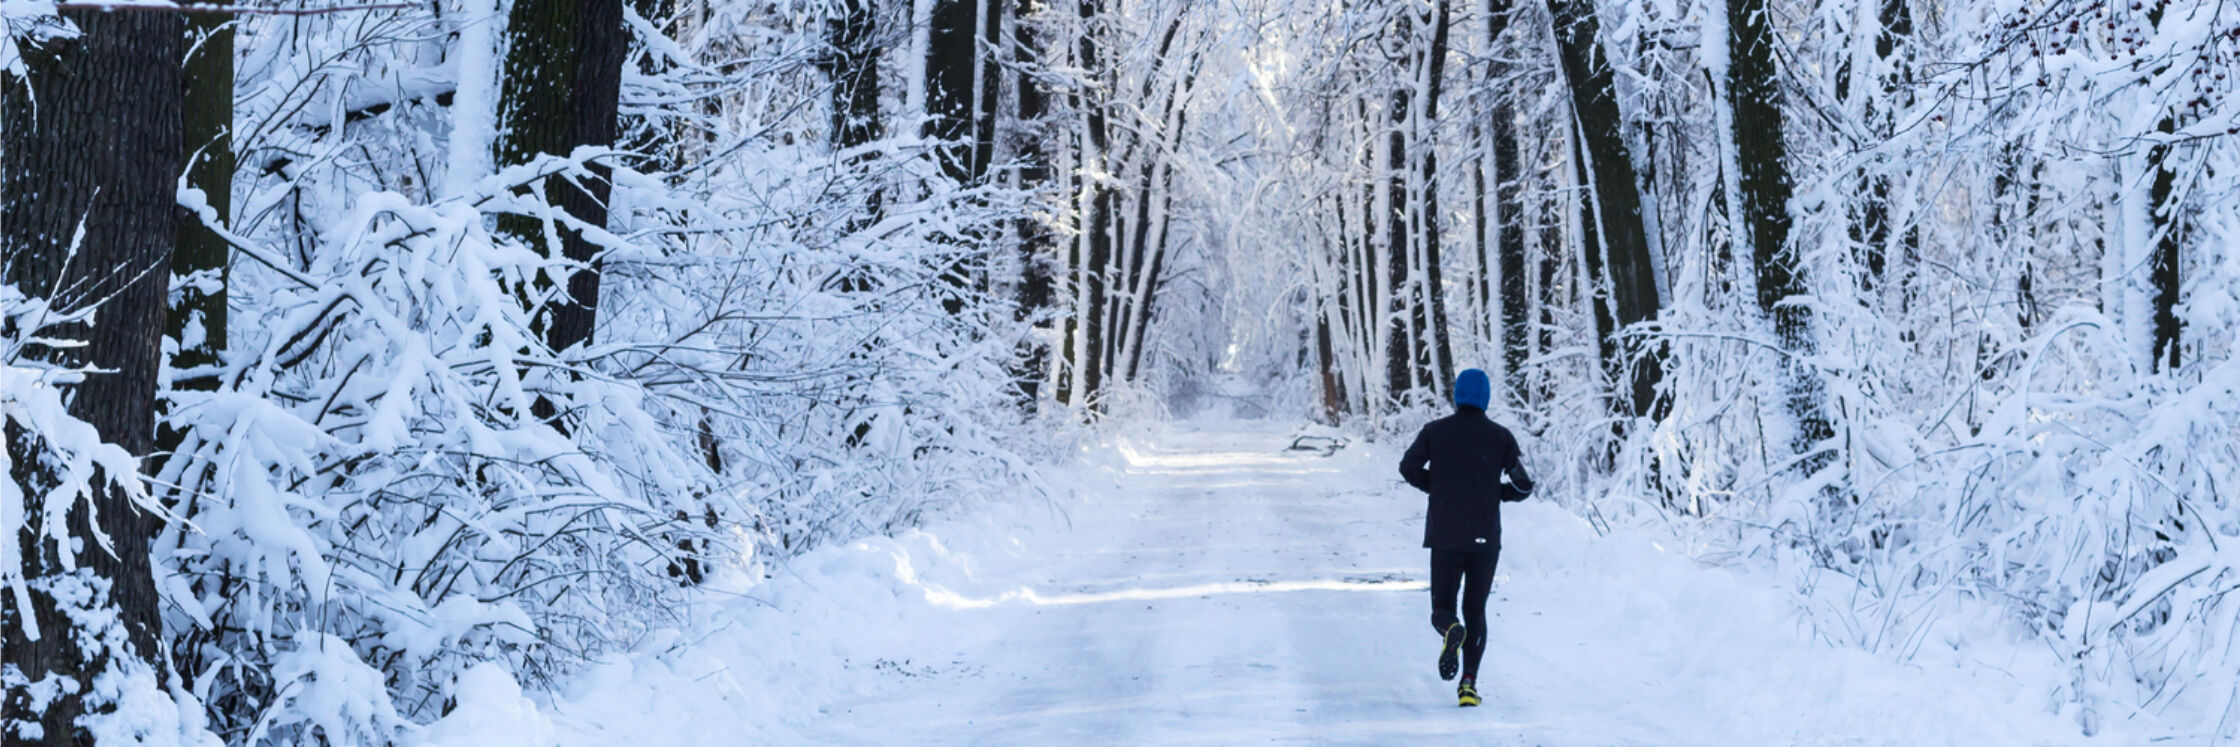 Winterseizoen: hardlopen in de kou